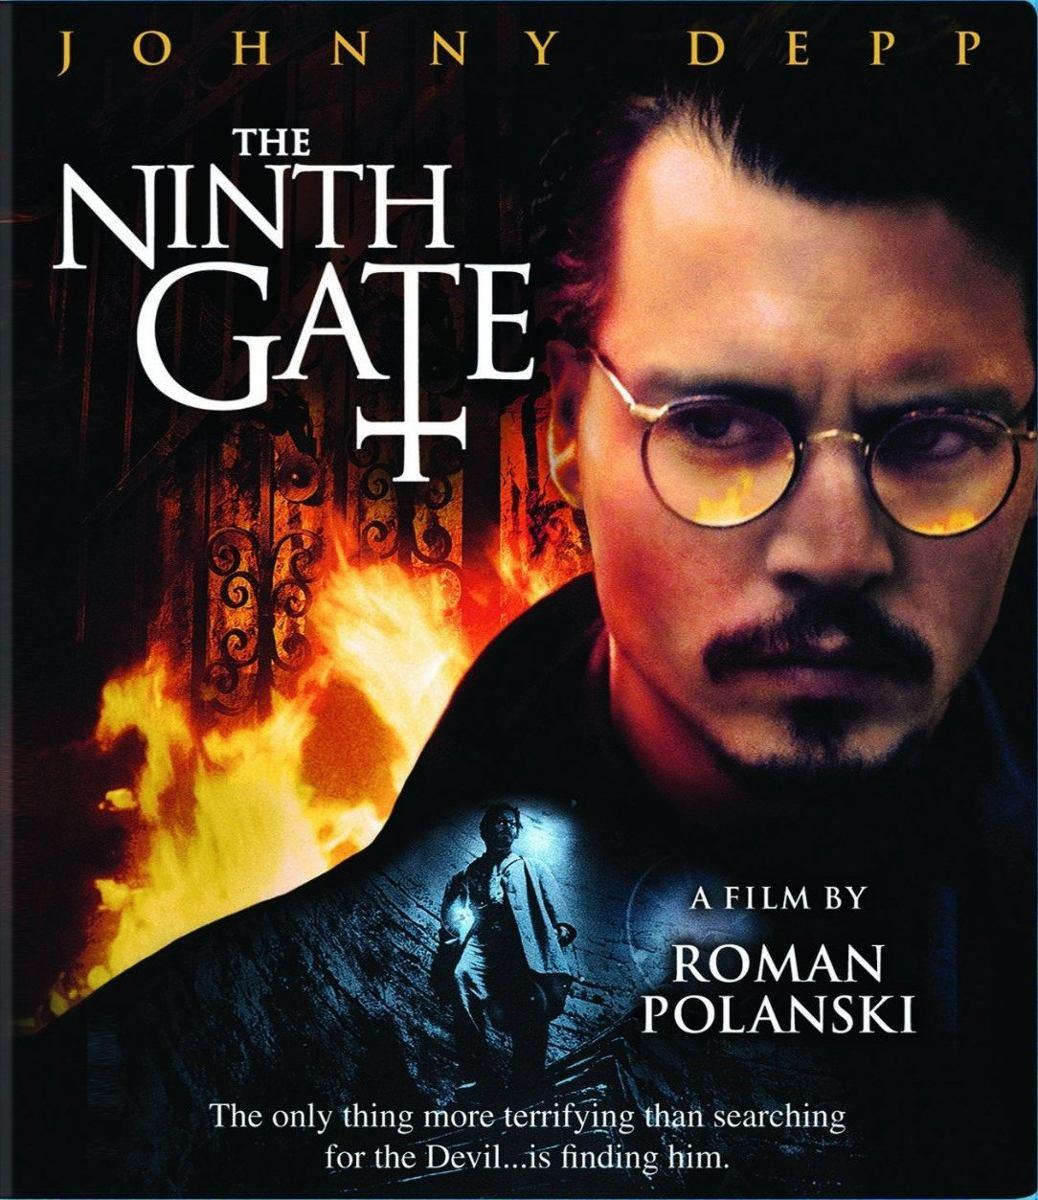 1001 películas que debes ver antes de forear. Roman Polanski - Página 3 The-ninth-gate-la-9a-puerta-de-roman-polanski-dvd-region-1-D_NQ_NP_469111-MLM20489033587_112015-F